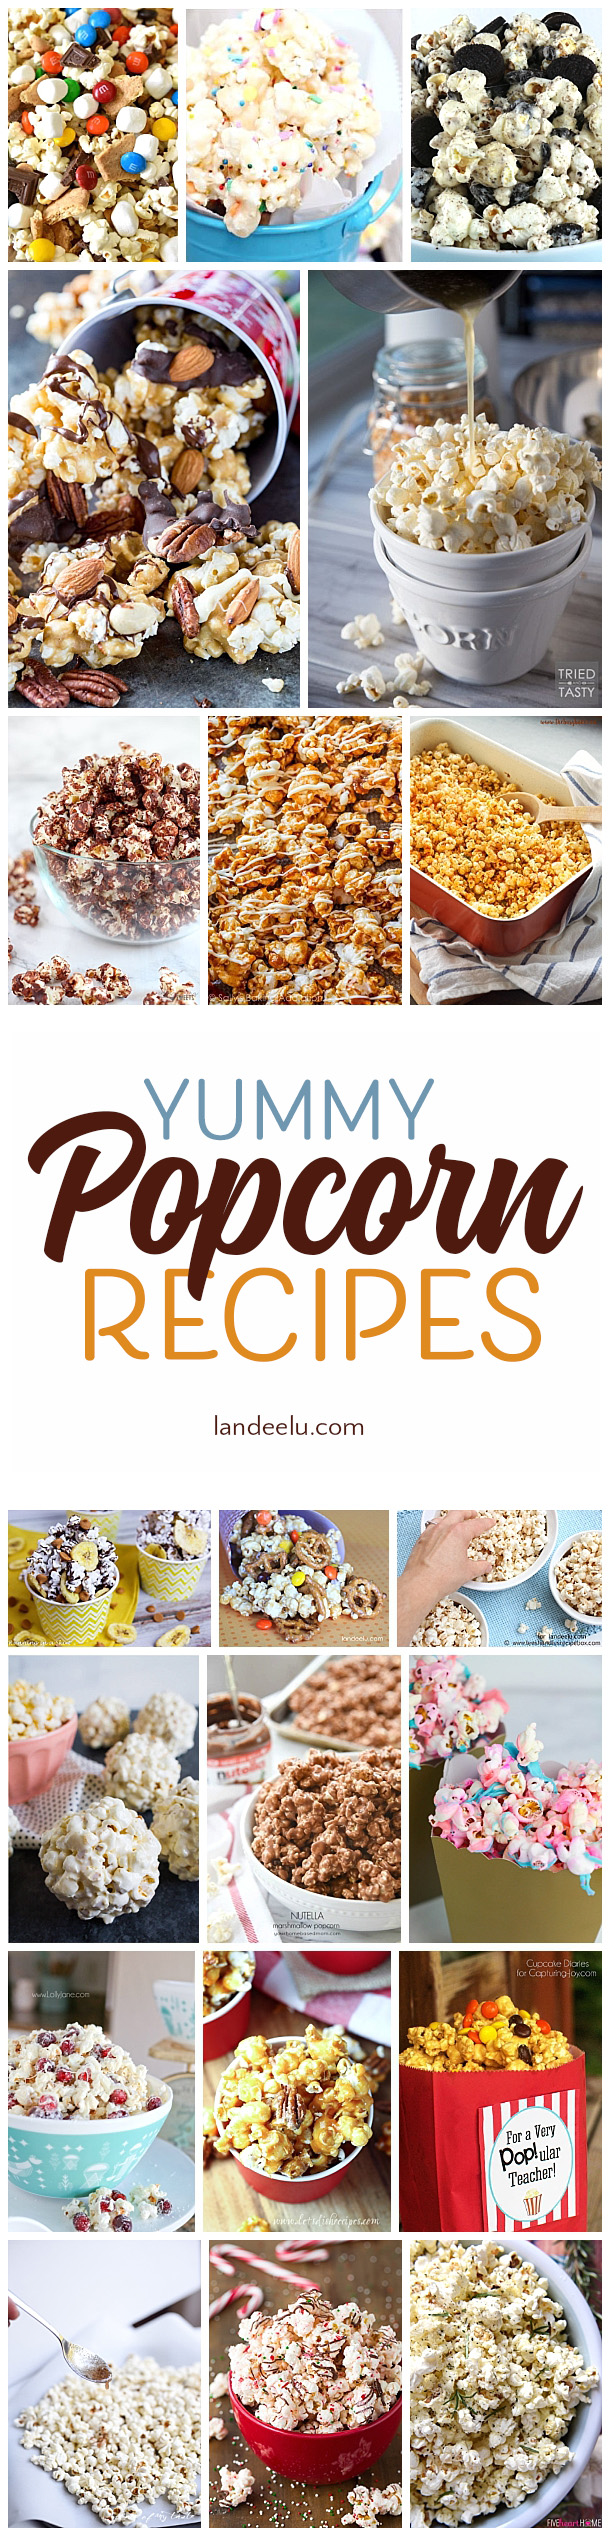 These popcorn recipes look amazing!